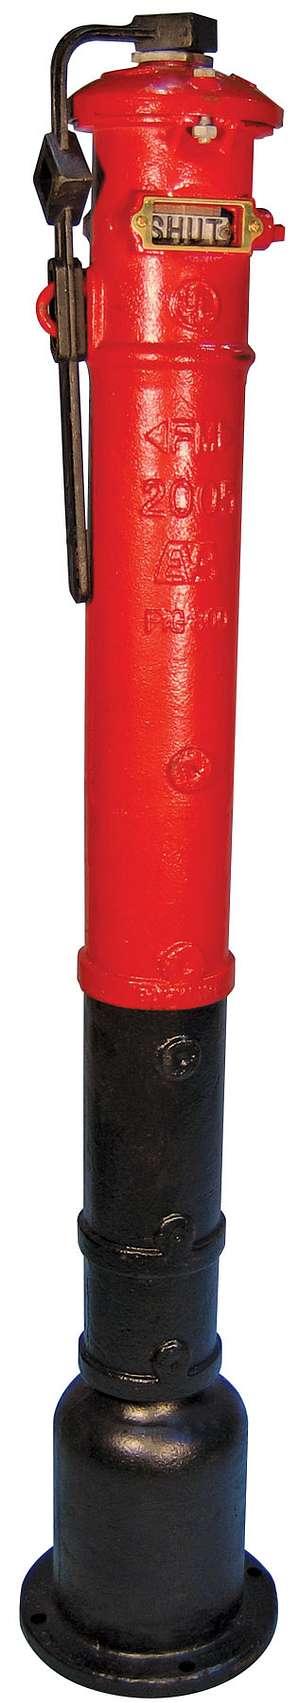 Series 774 FireLock™ NRS Upright Post Indicator